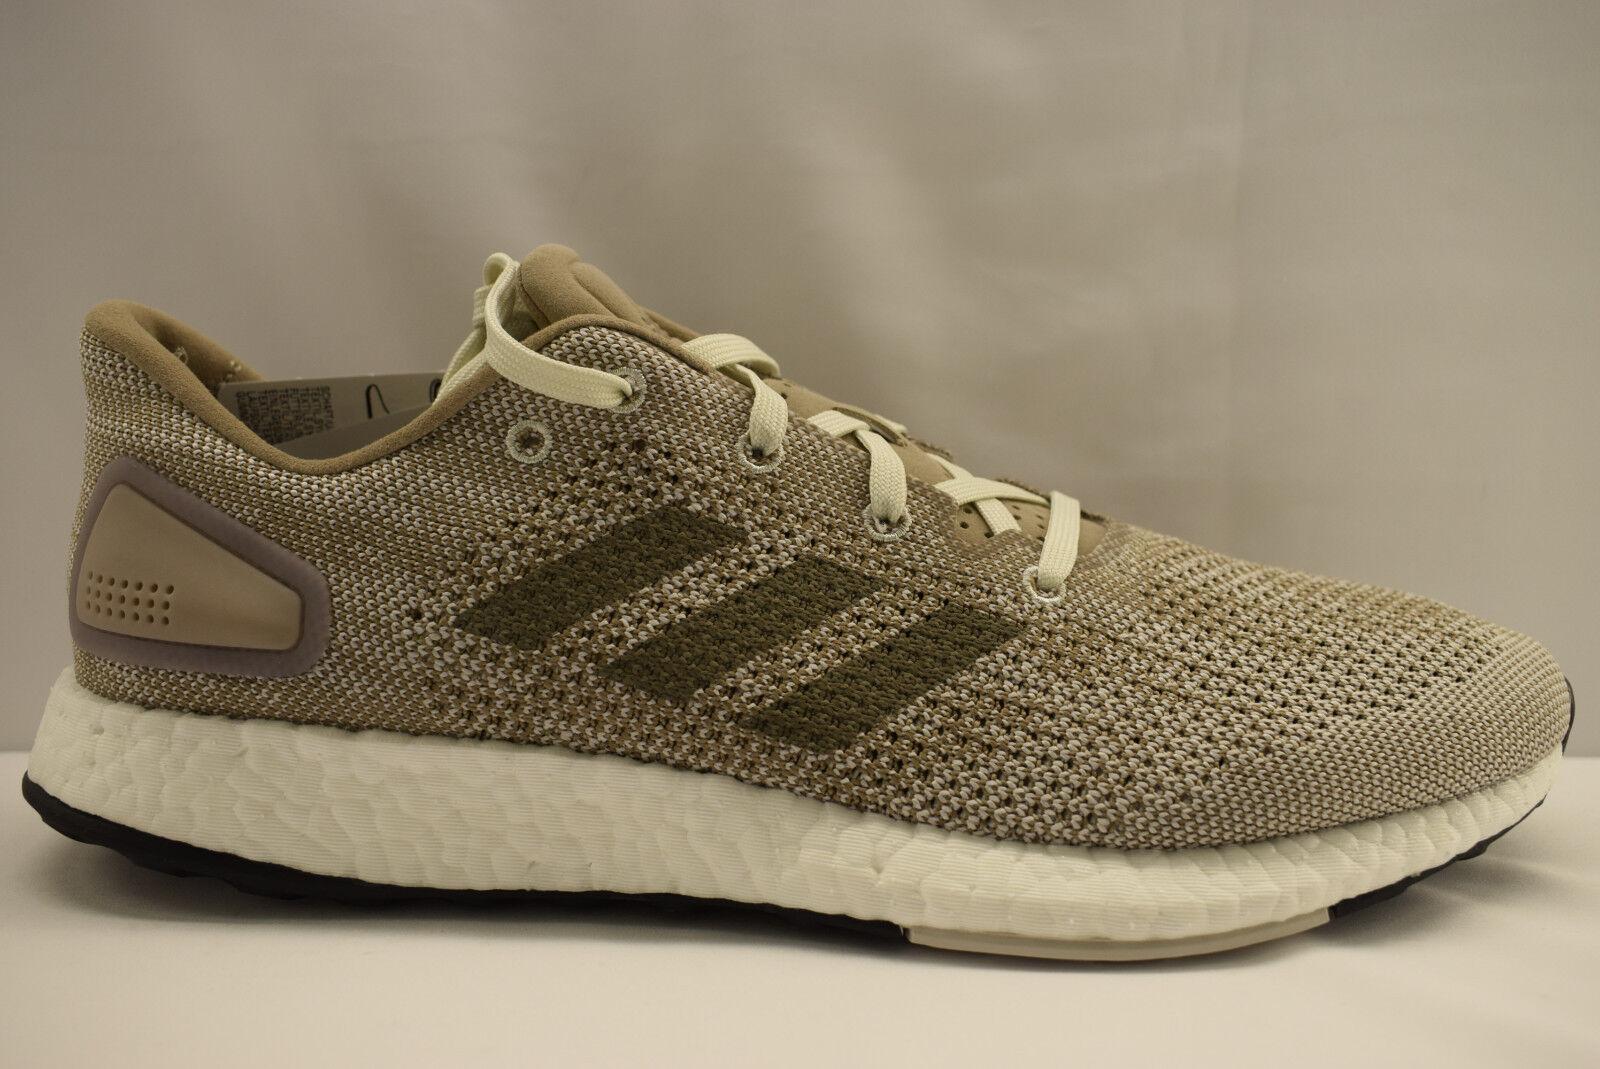 Adidas PureBOOST DPR S82013 Sneaker Herrenschuhe